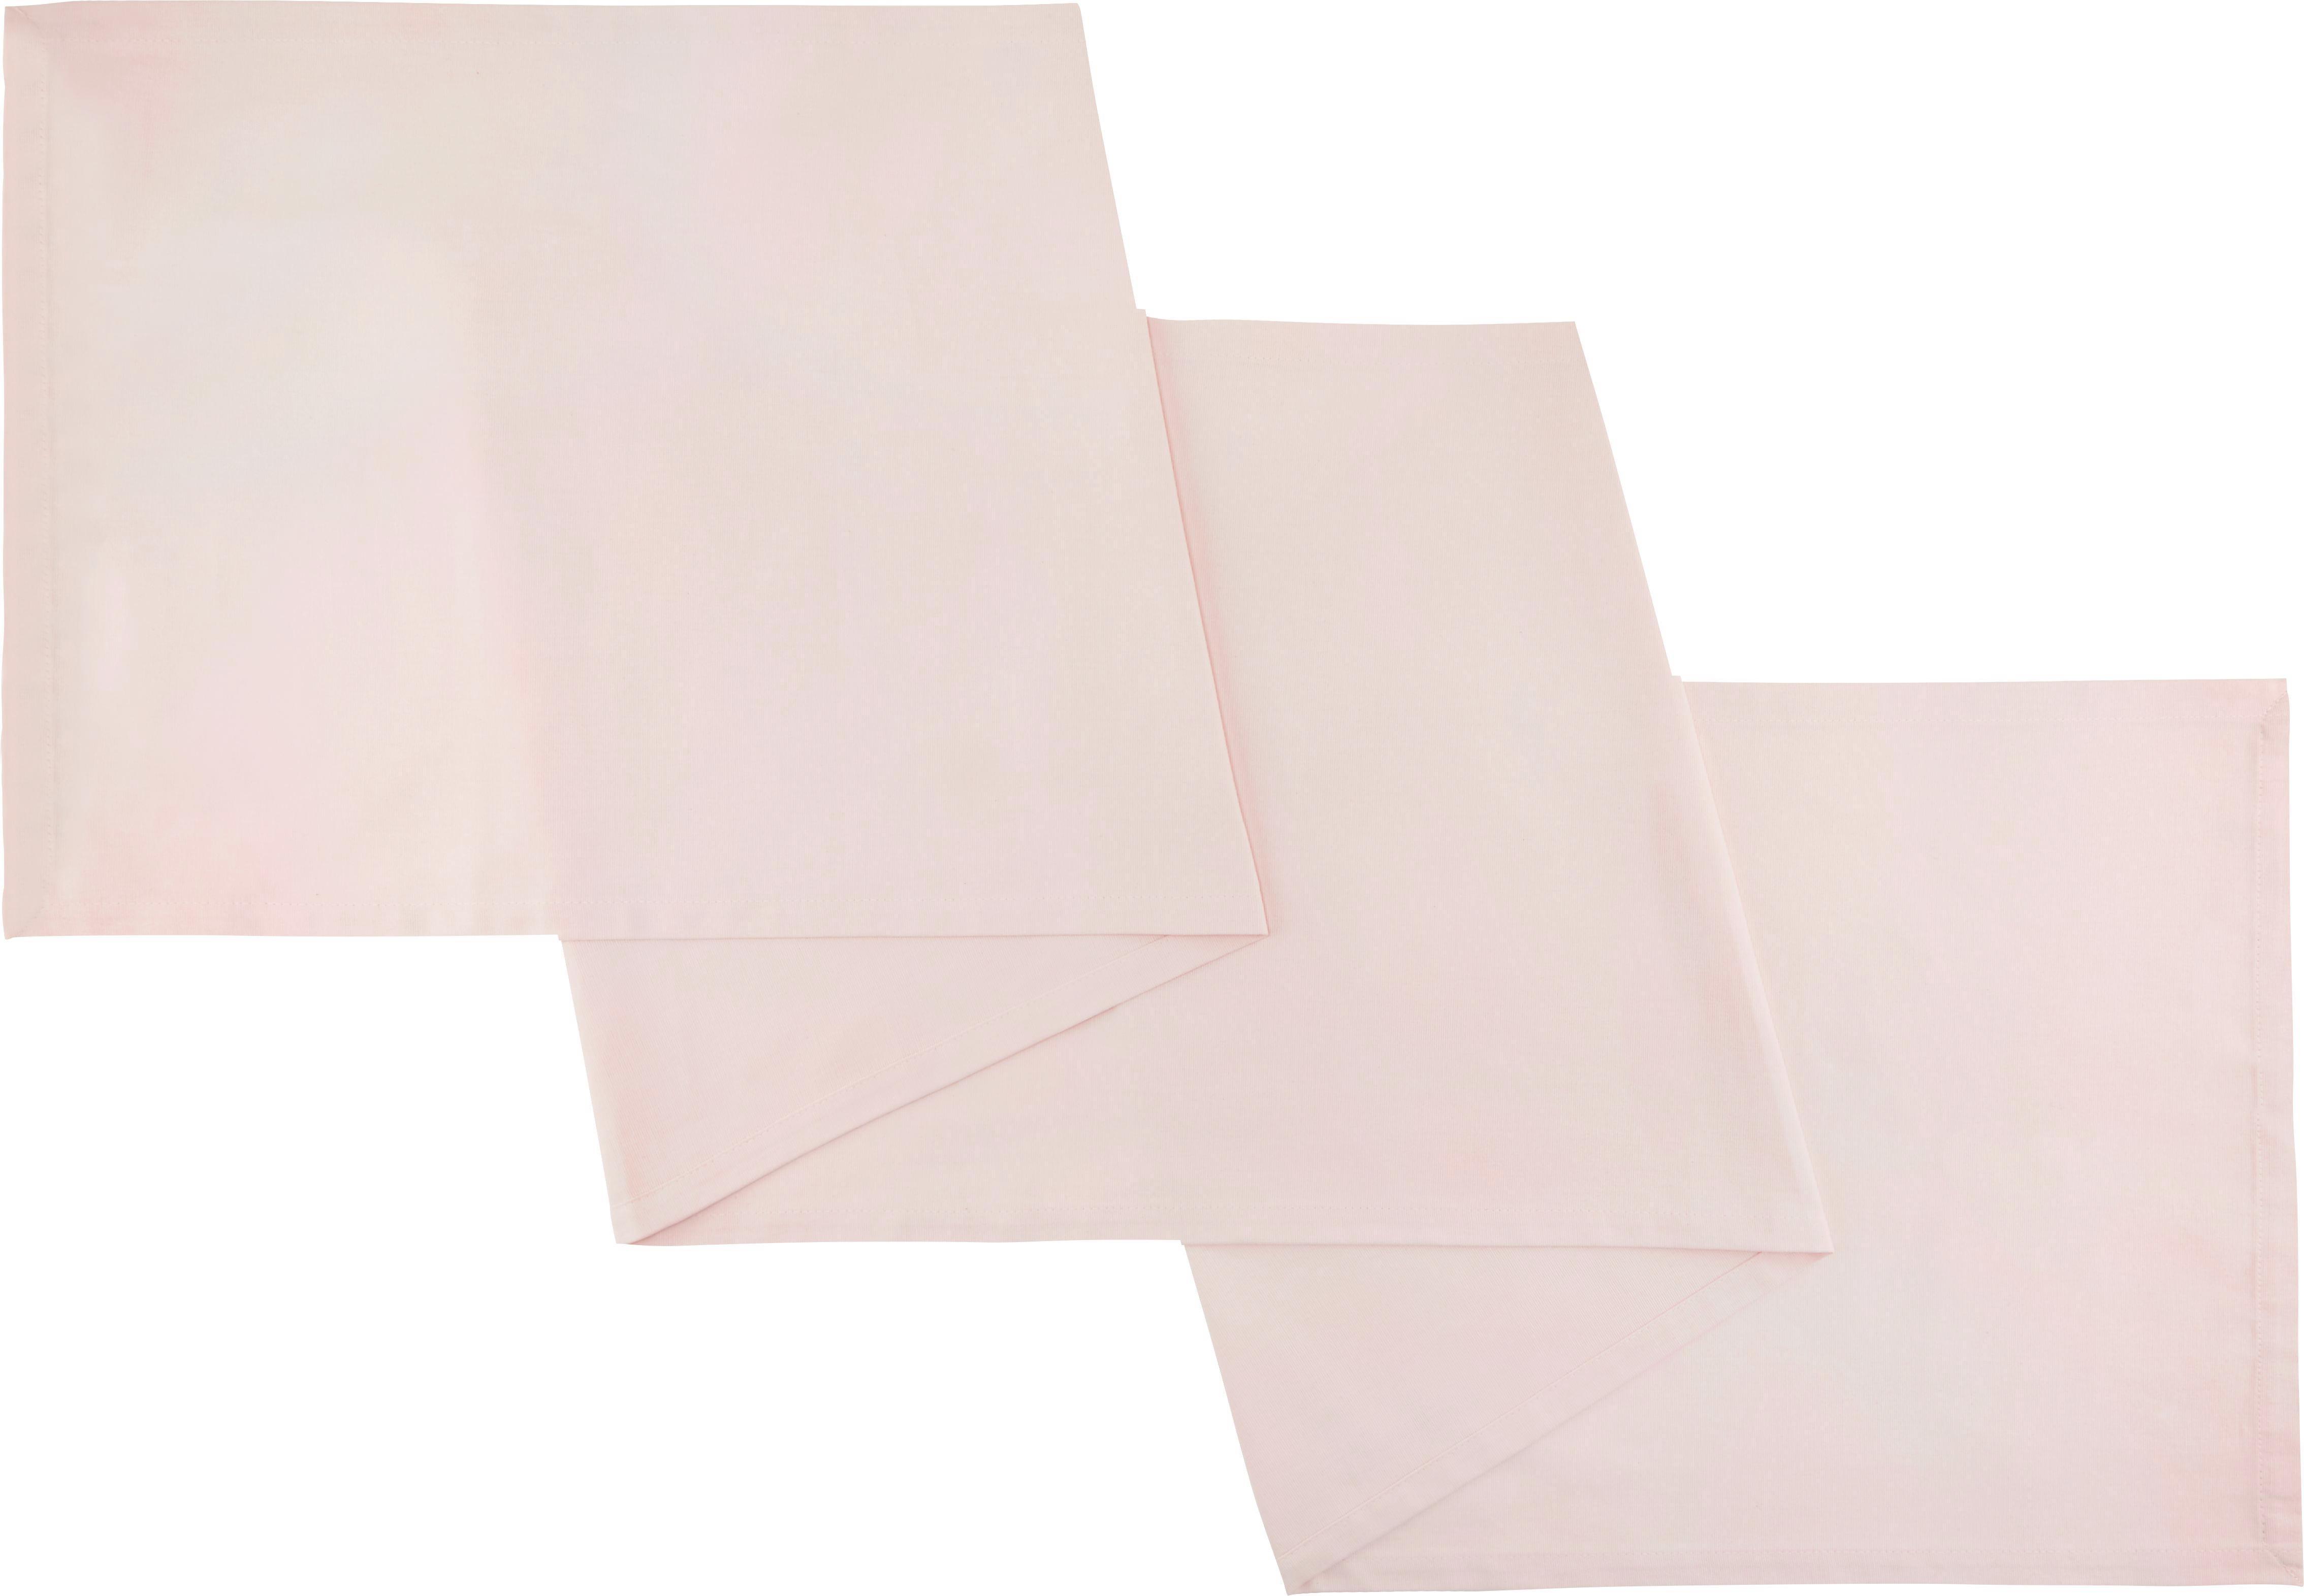 Tischläufer Steffi in Altrosa - Altrosa, Textil (45/150cm) - MÖMAX modern living